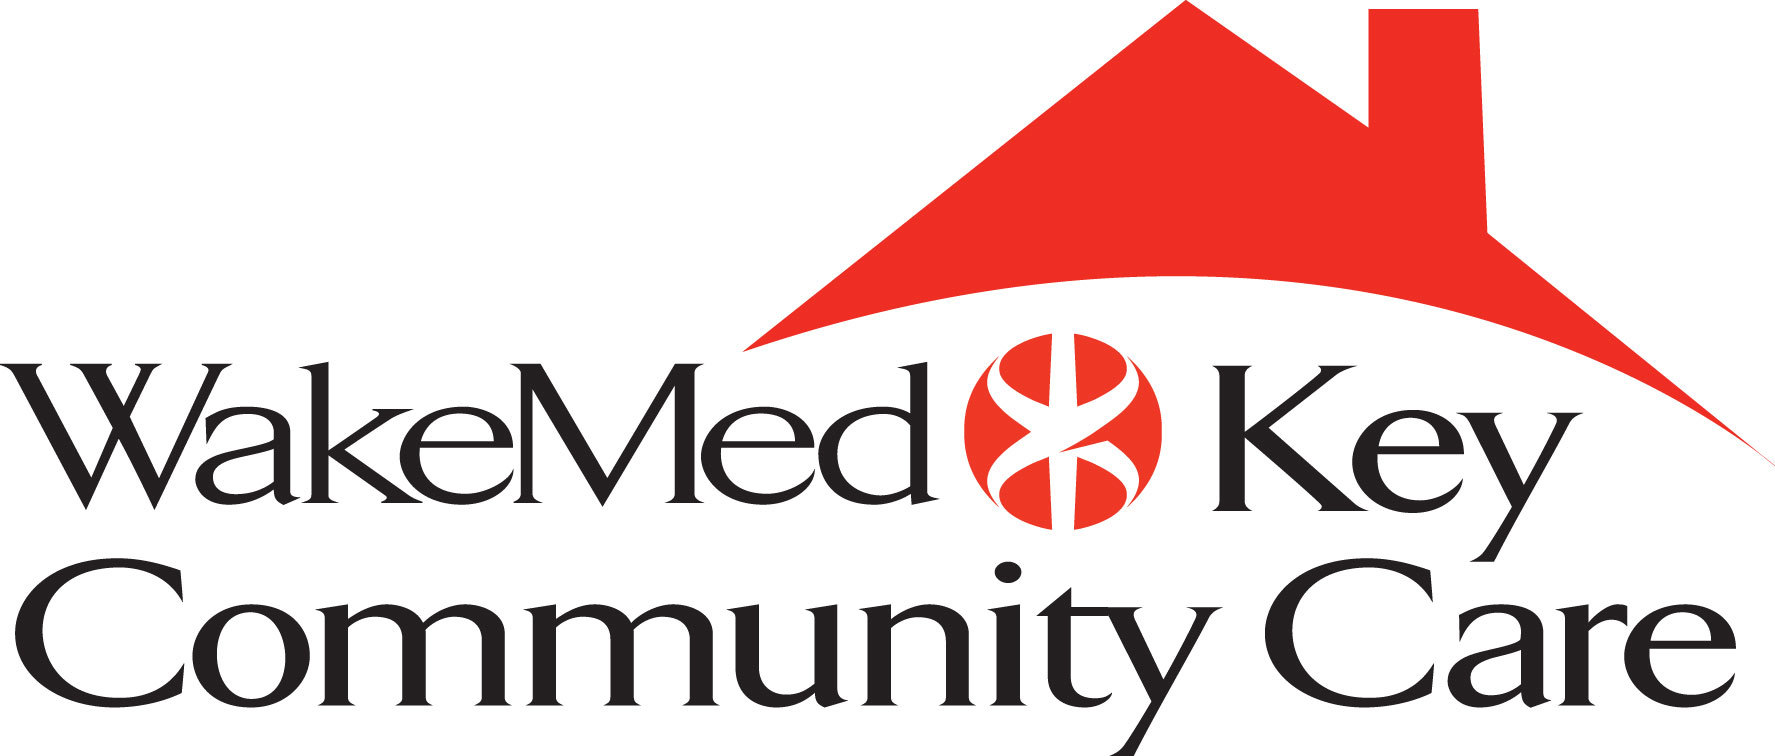 WakeMed Key Community Care Partners With Cigna to Advance Quality